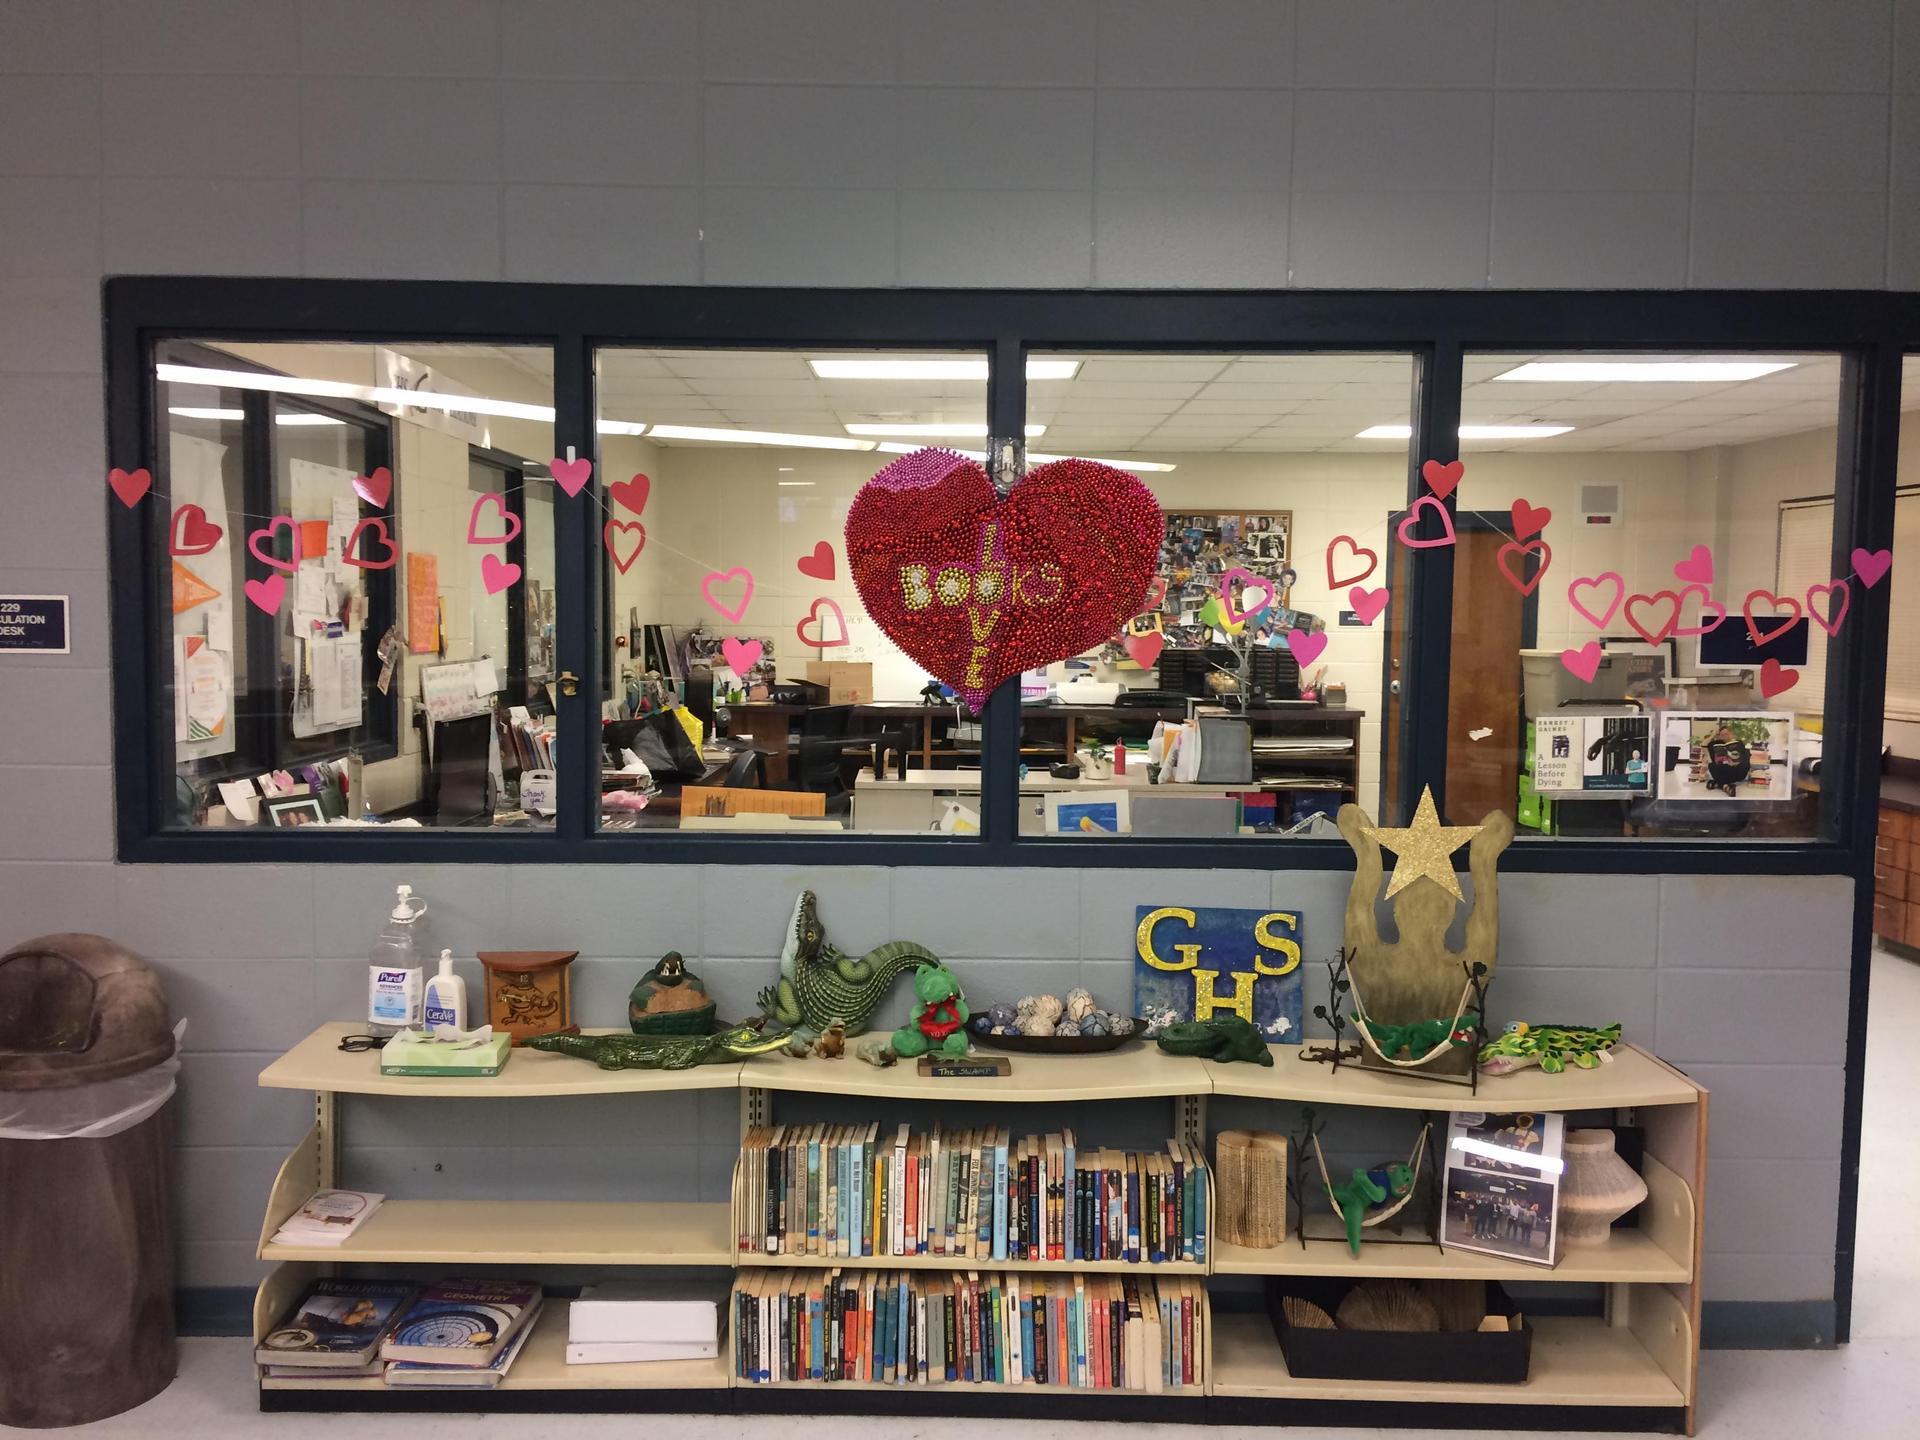 Heart display behind counter